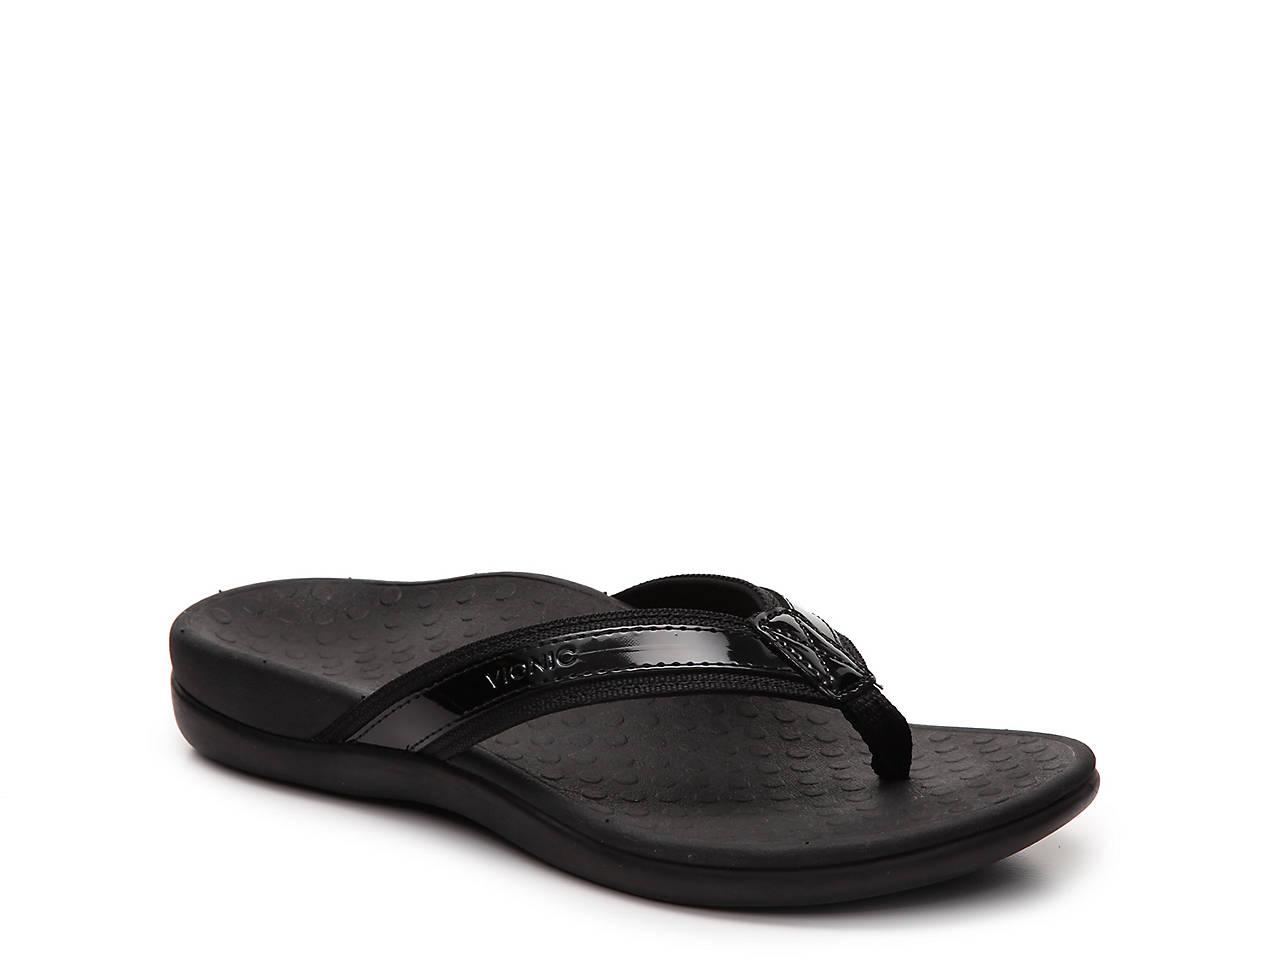 a52dd4da06e2 Vionic Tide II Flip Flop Women s Shoes